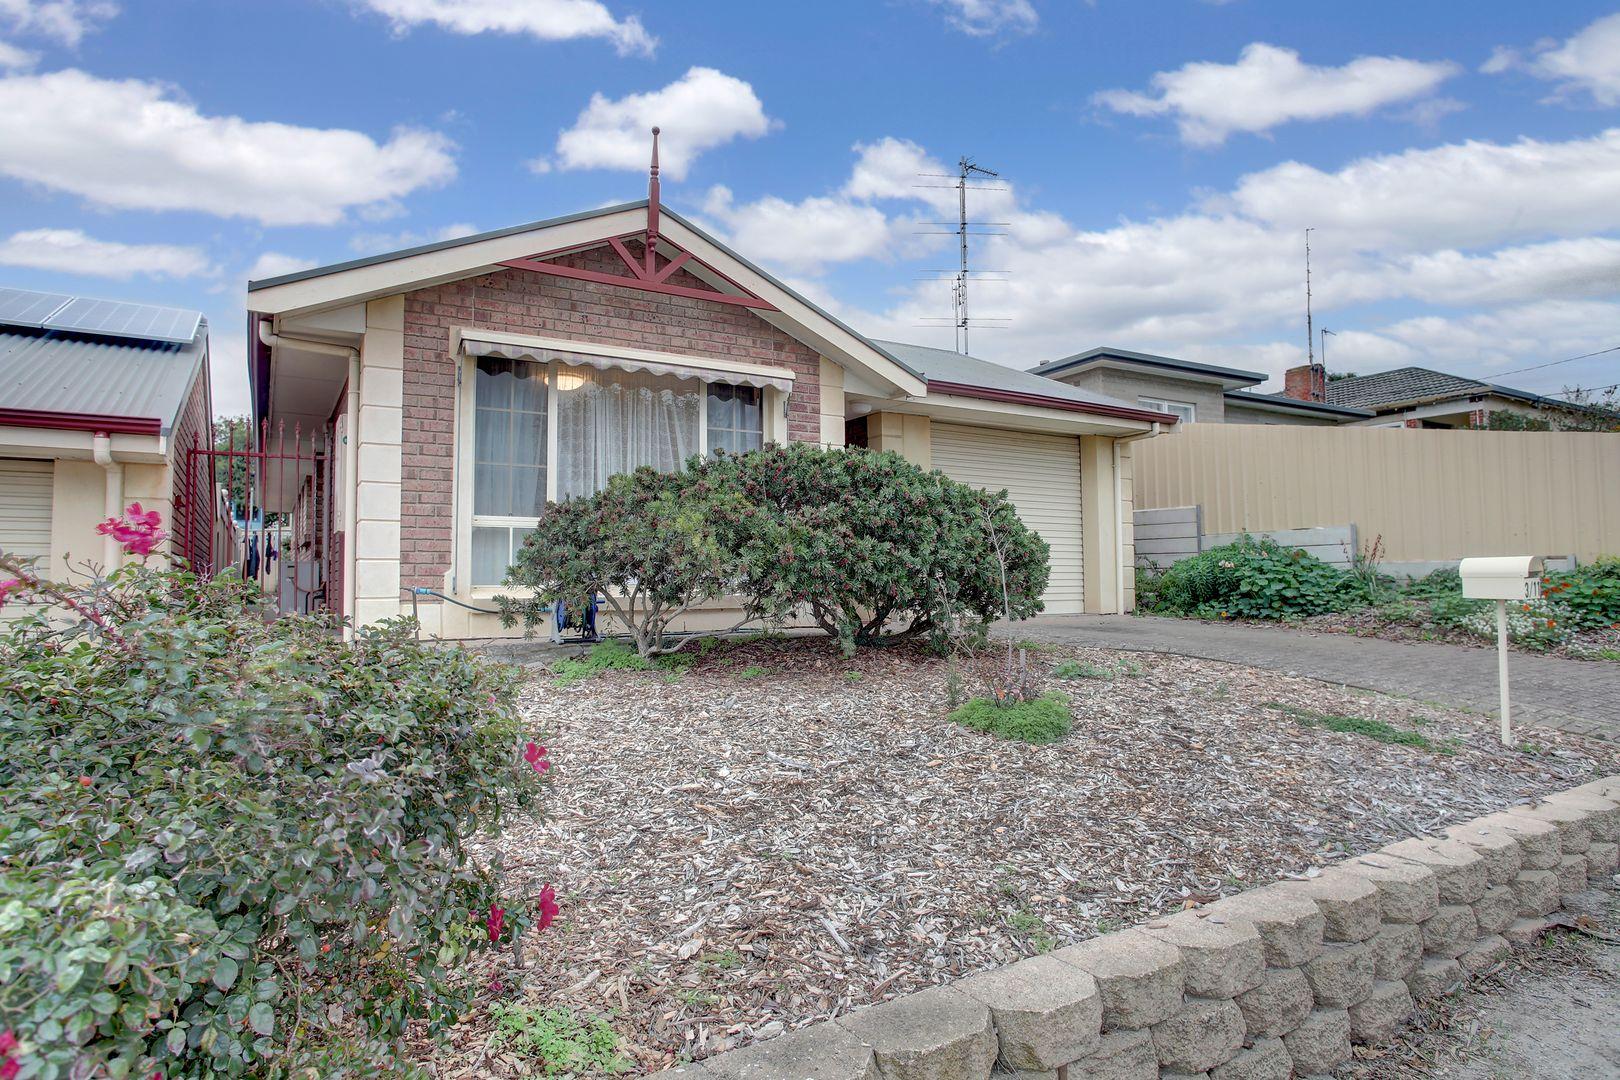 3/11 Stuart Terrace, Port Lincoln SA 5606, Image 0